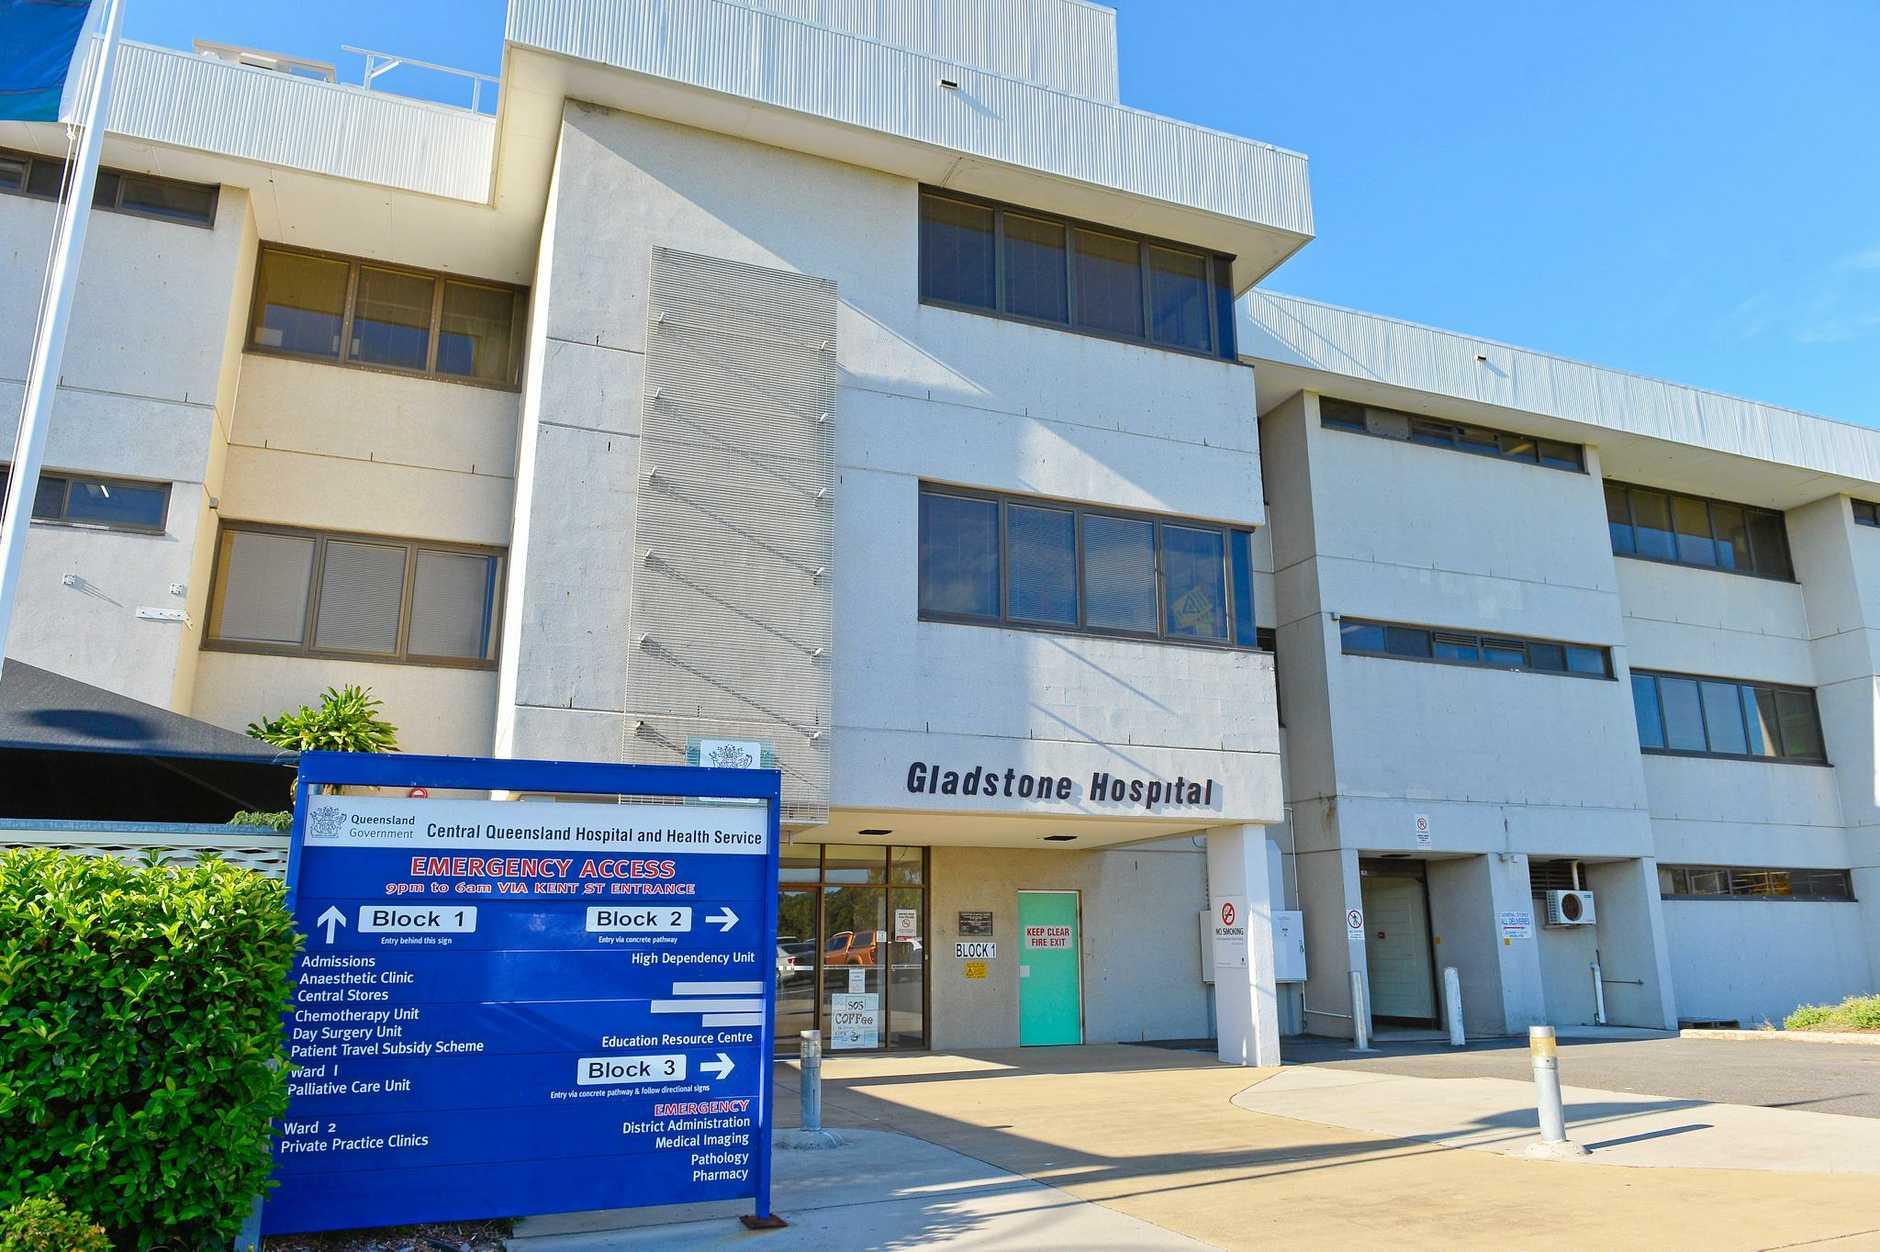 Gladstone hospital January 19, 2017